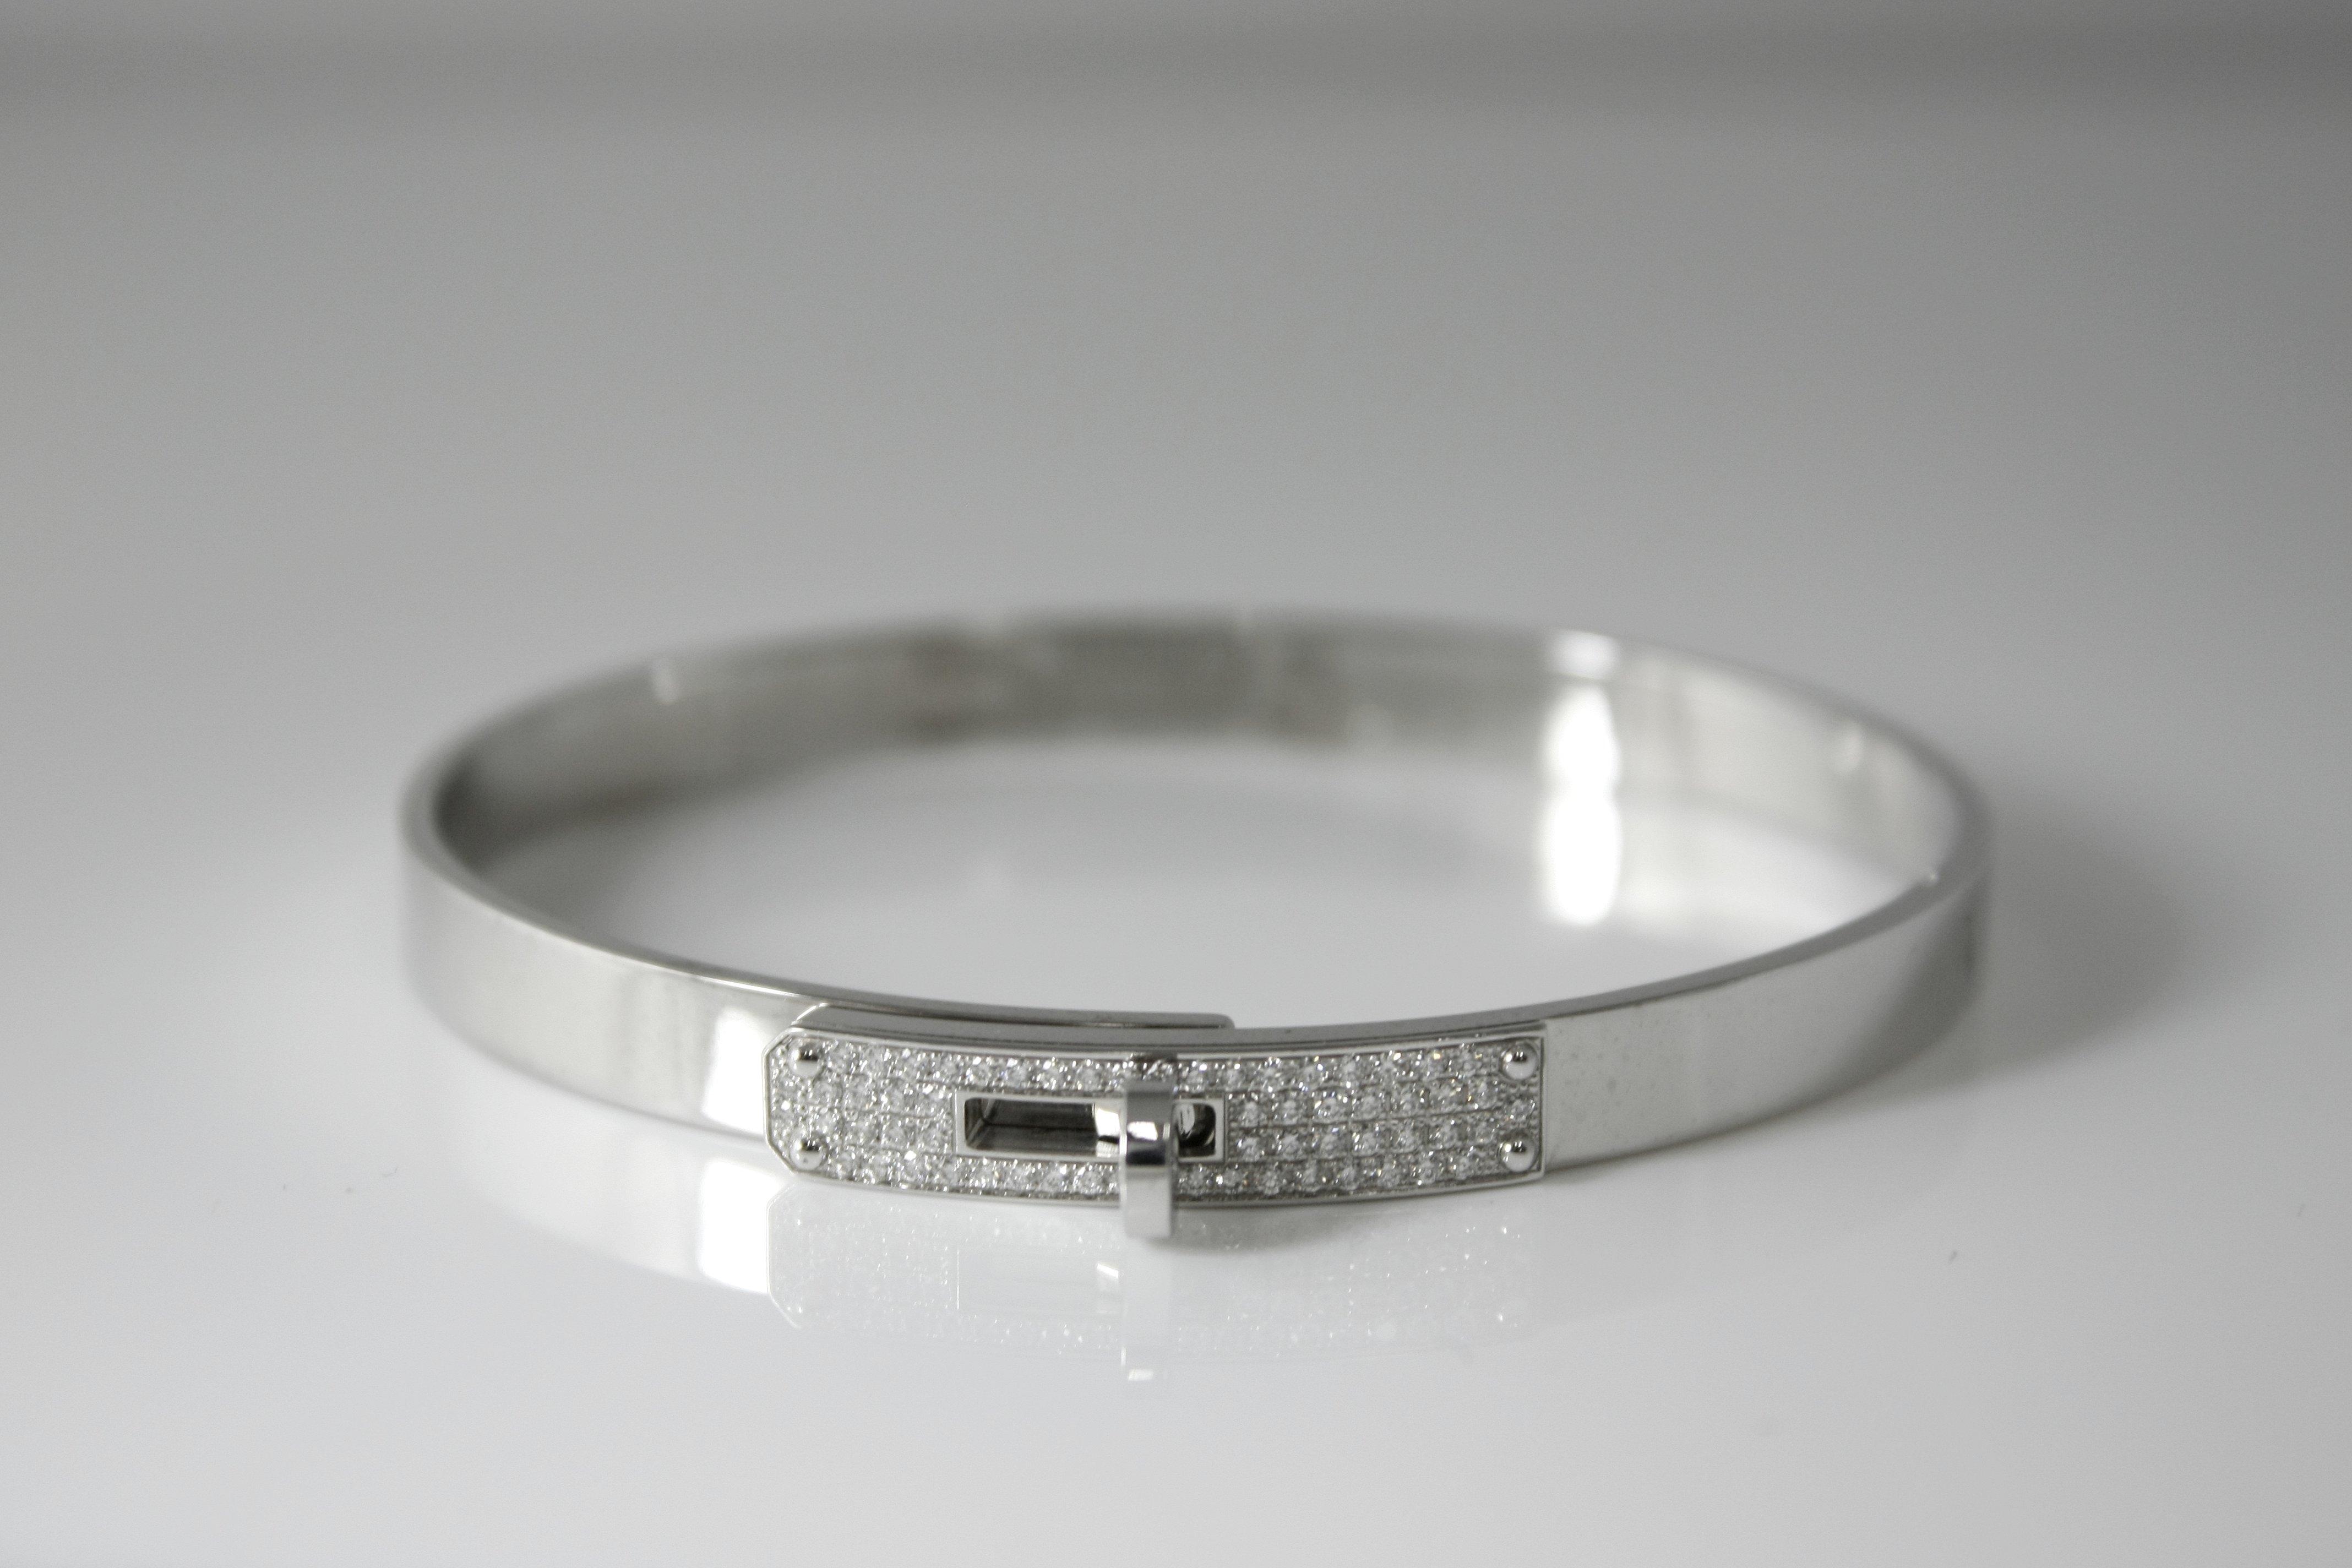 Hermes Kelly Bracelet Gold & Diamonds - $9,500